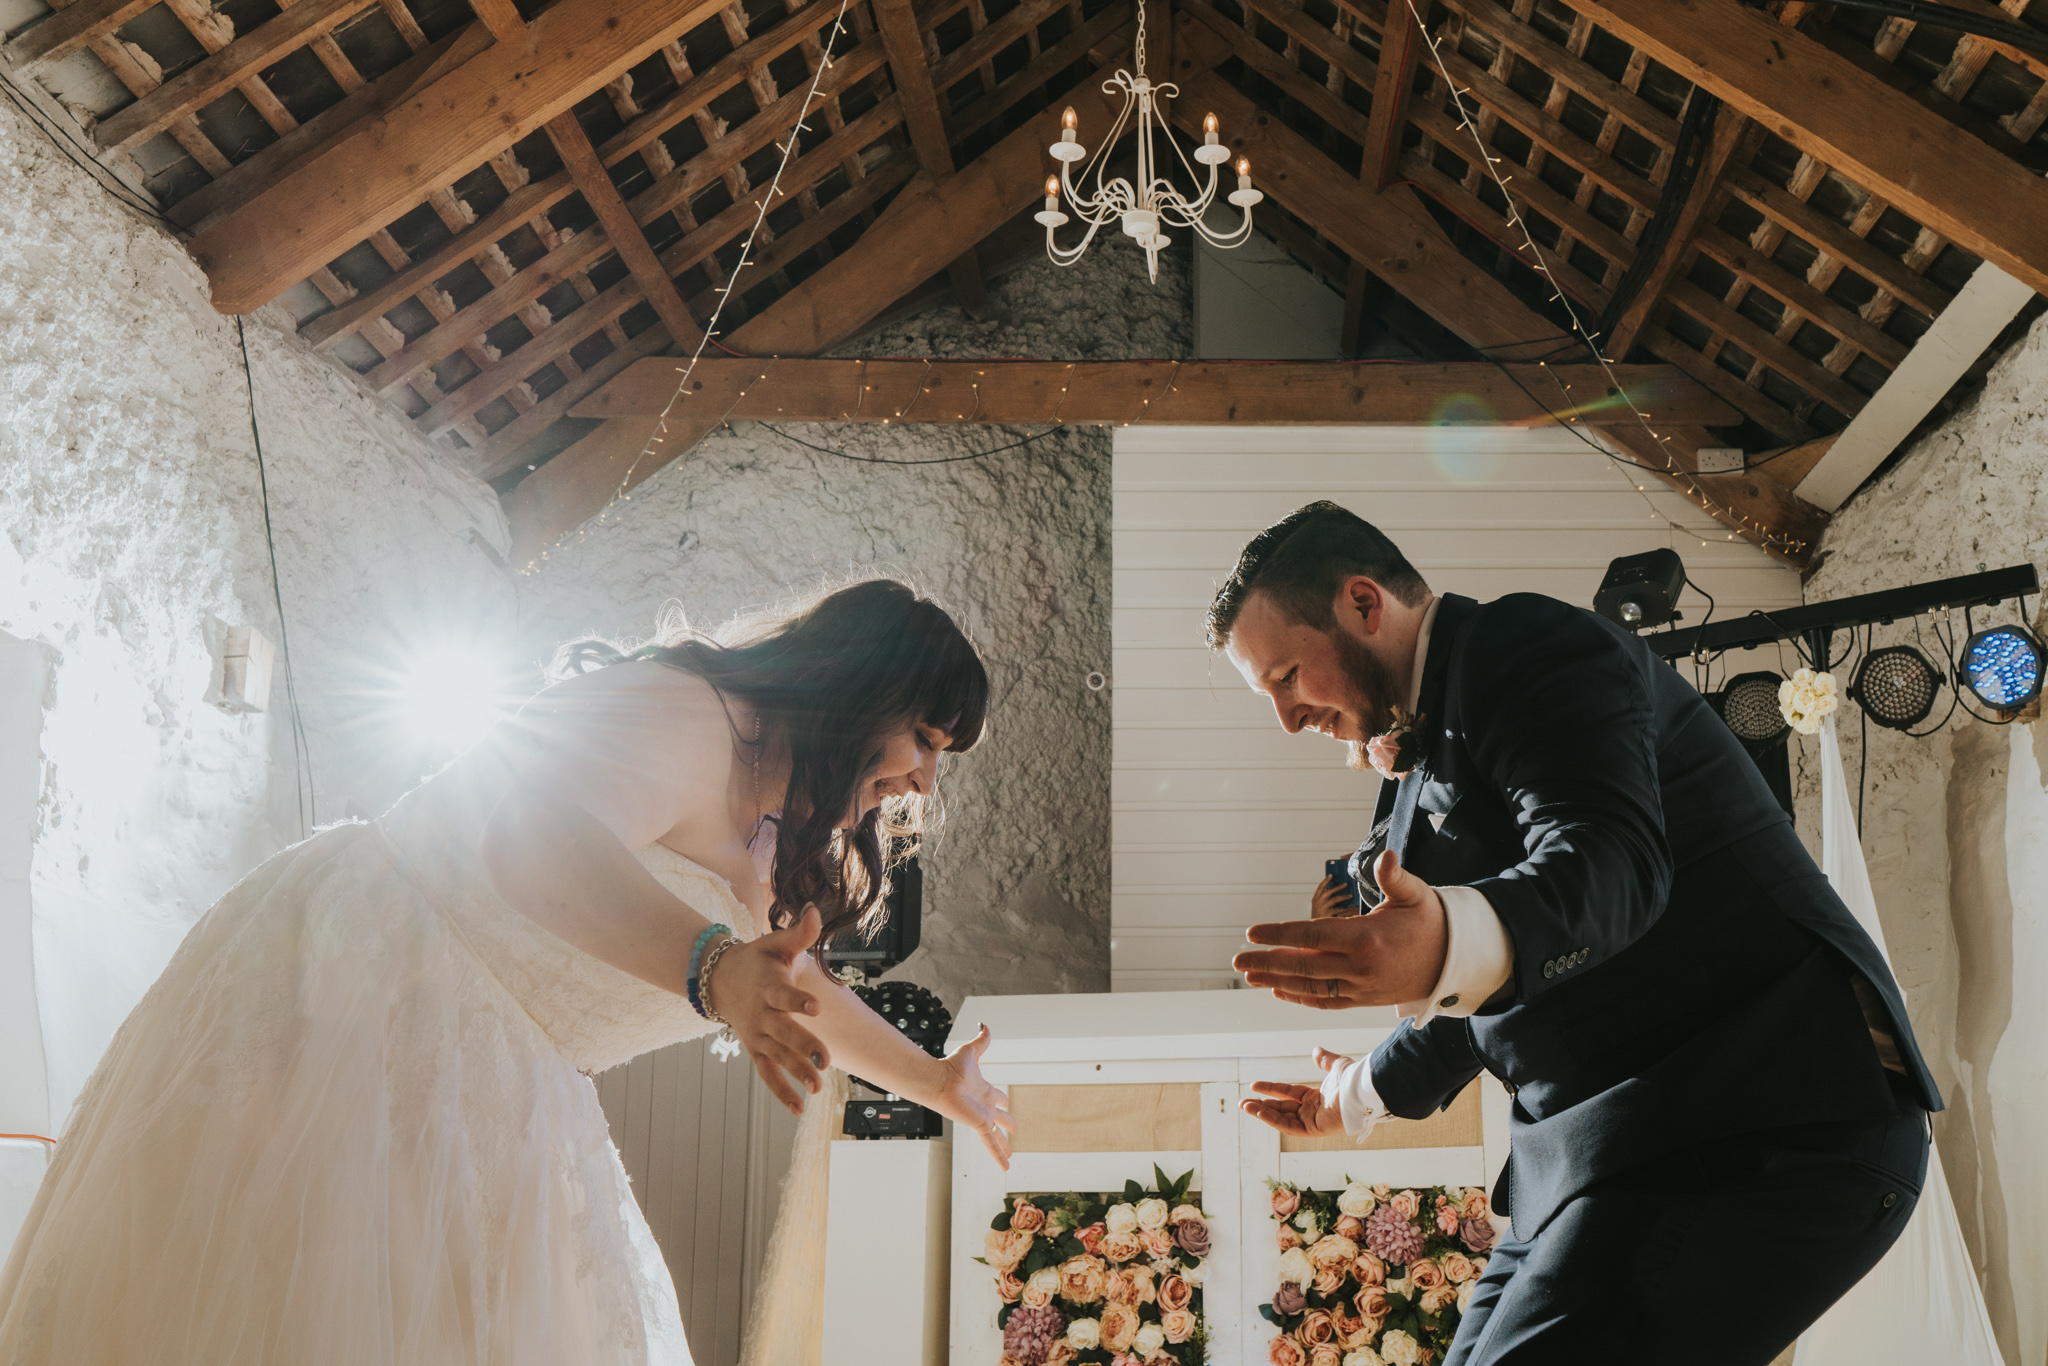 grace-sam-old-barn-clovelly-devon-wedding-photographer-grace-elizabeth-essex-suffolk-norfolk-wedding-photographer (119 of 132).jpg